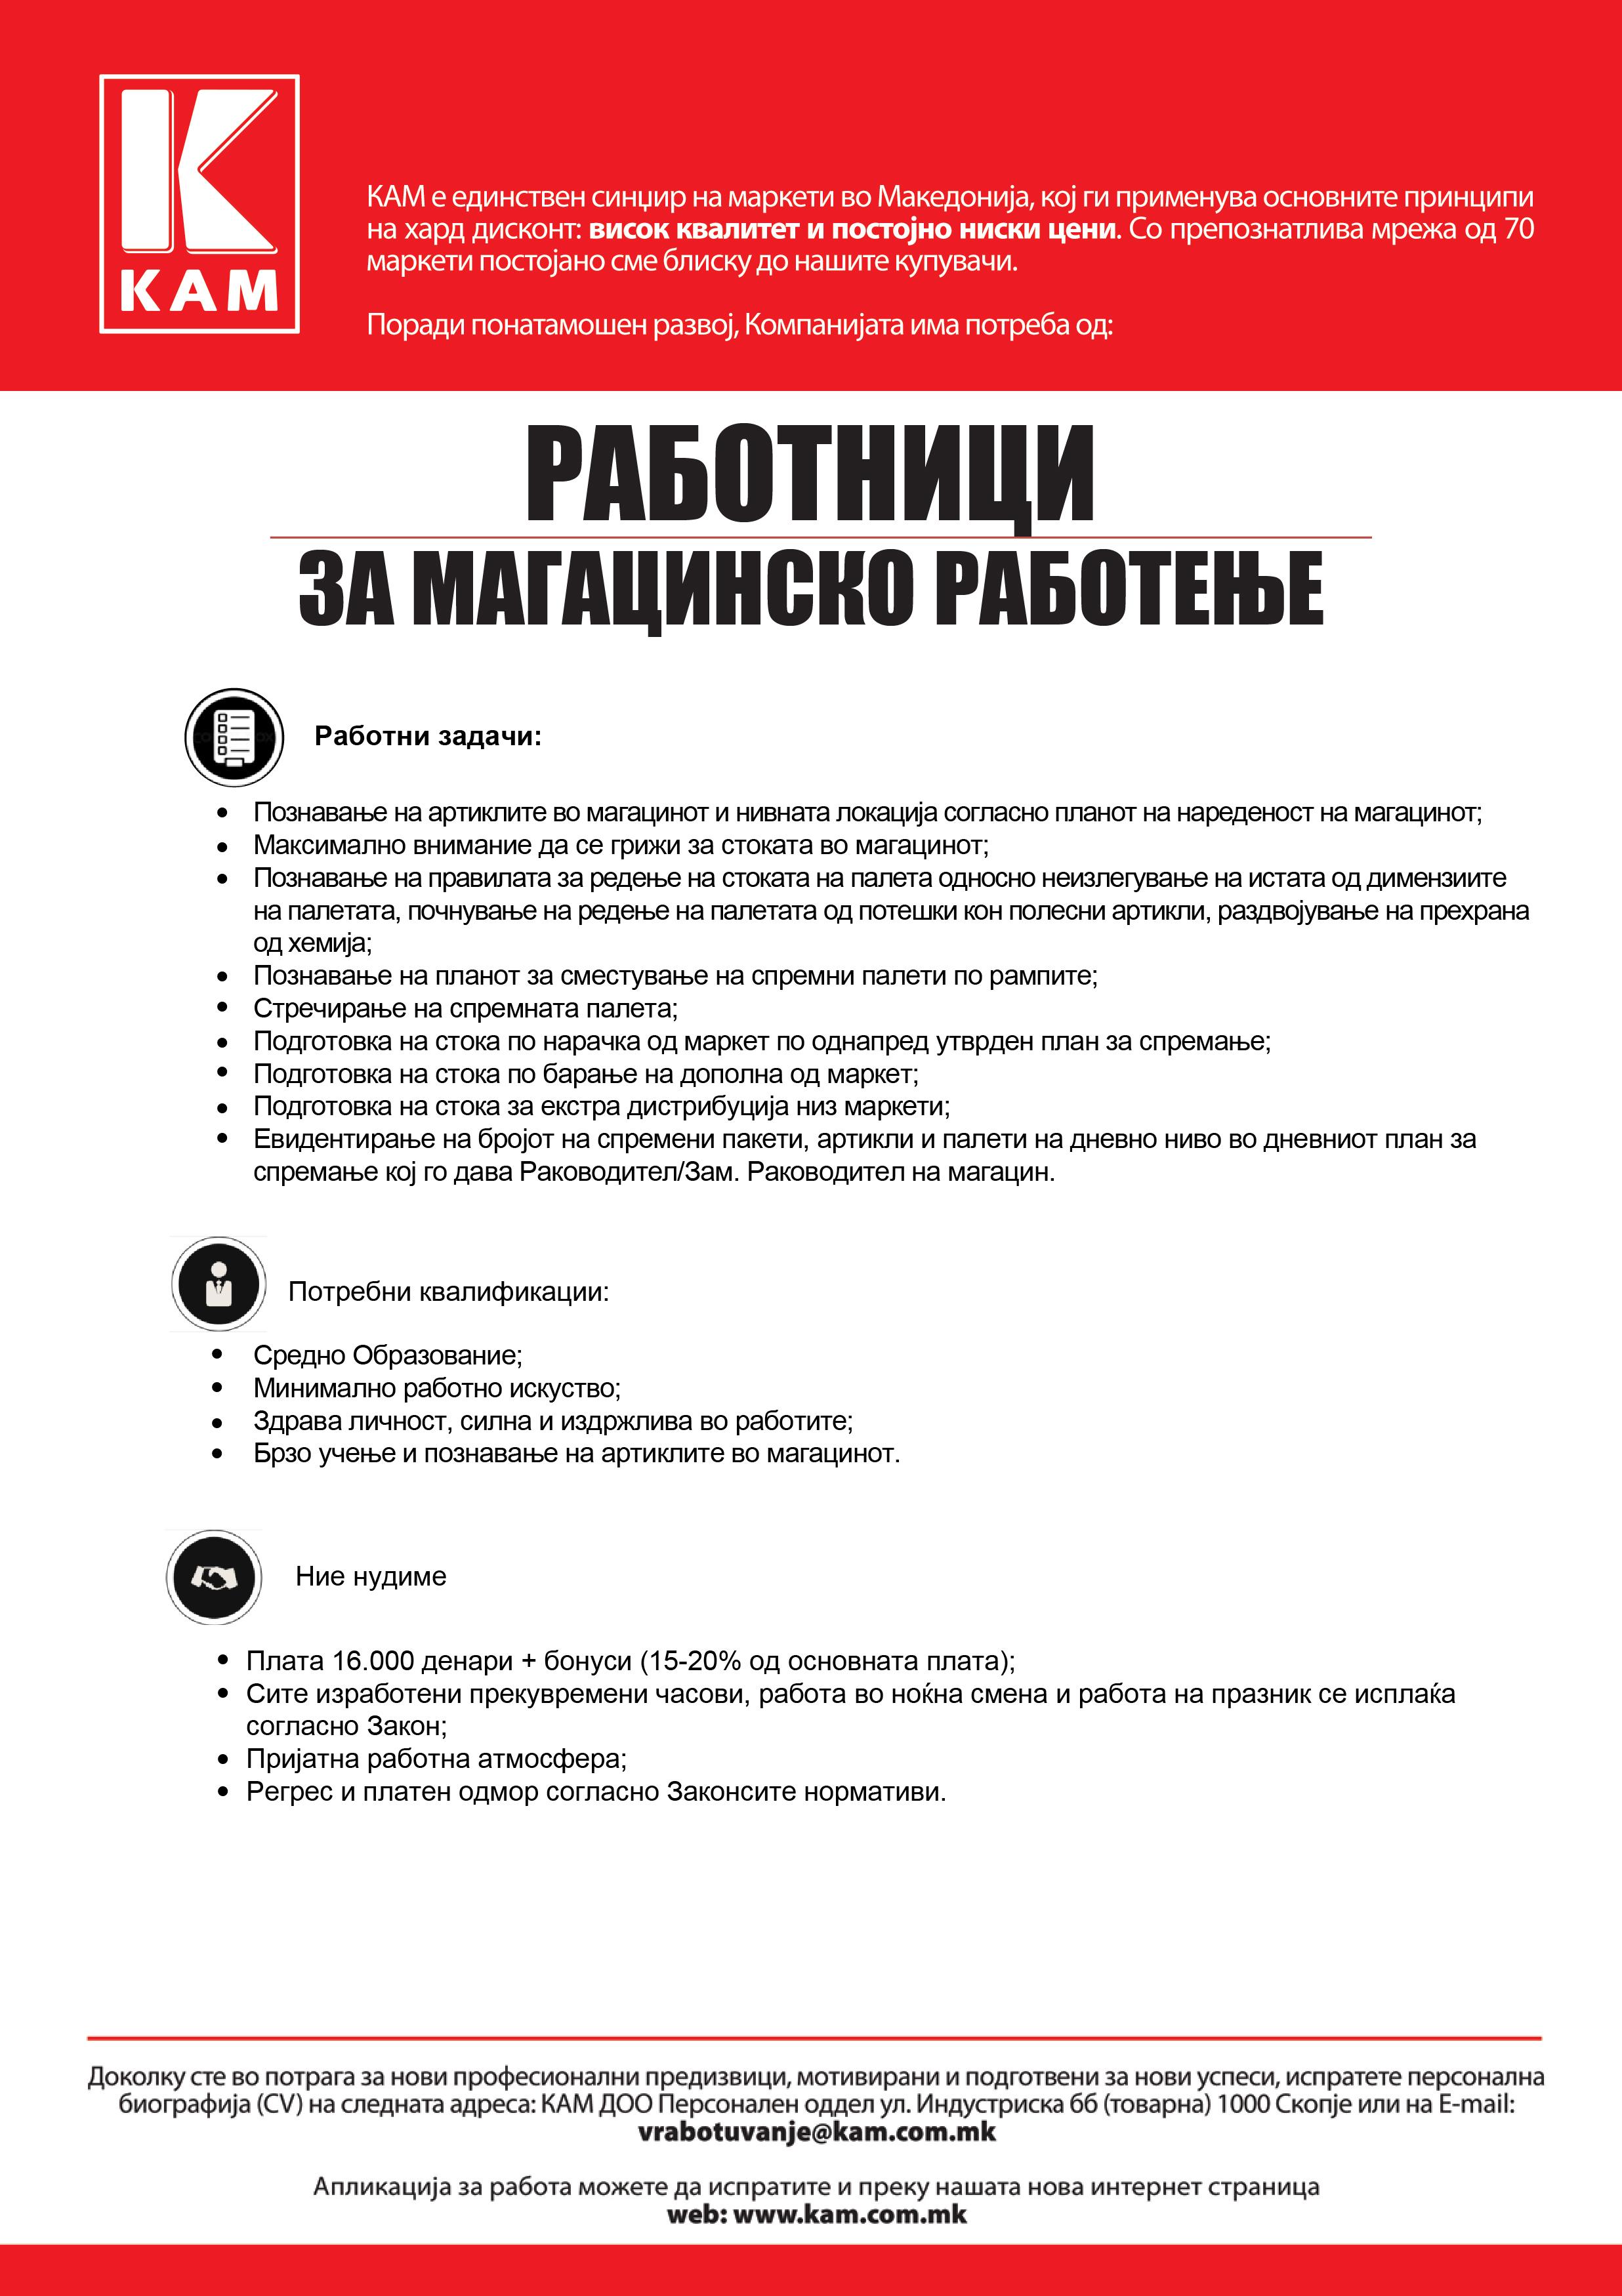 new 10 RABOTNICI ZA MAGACINSKO RABOTENJE-01